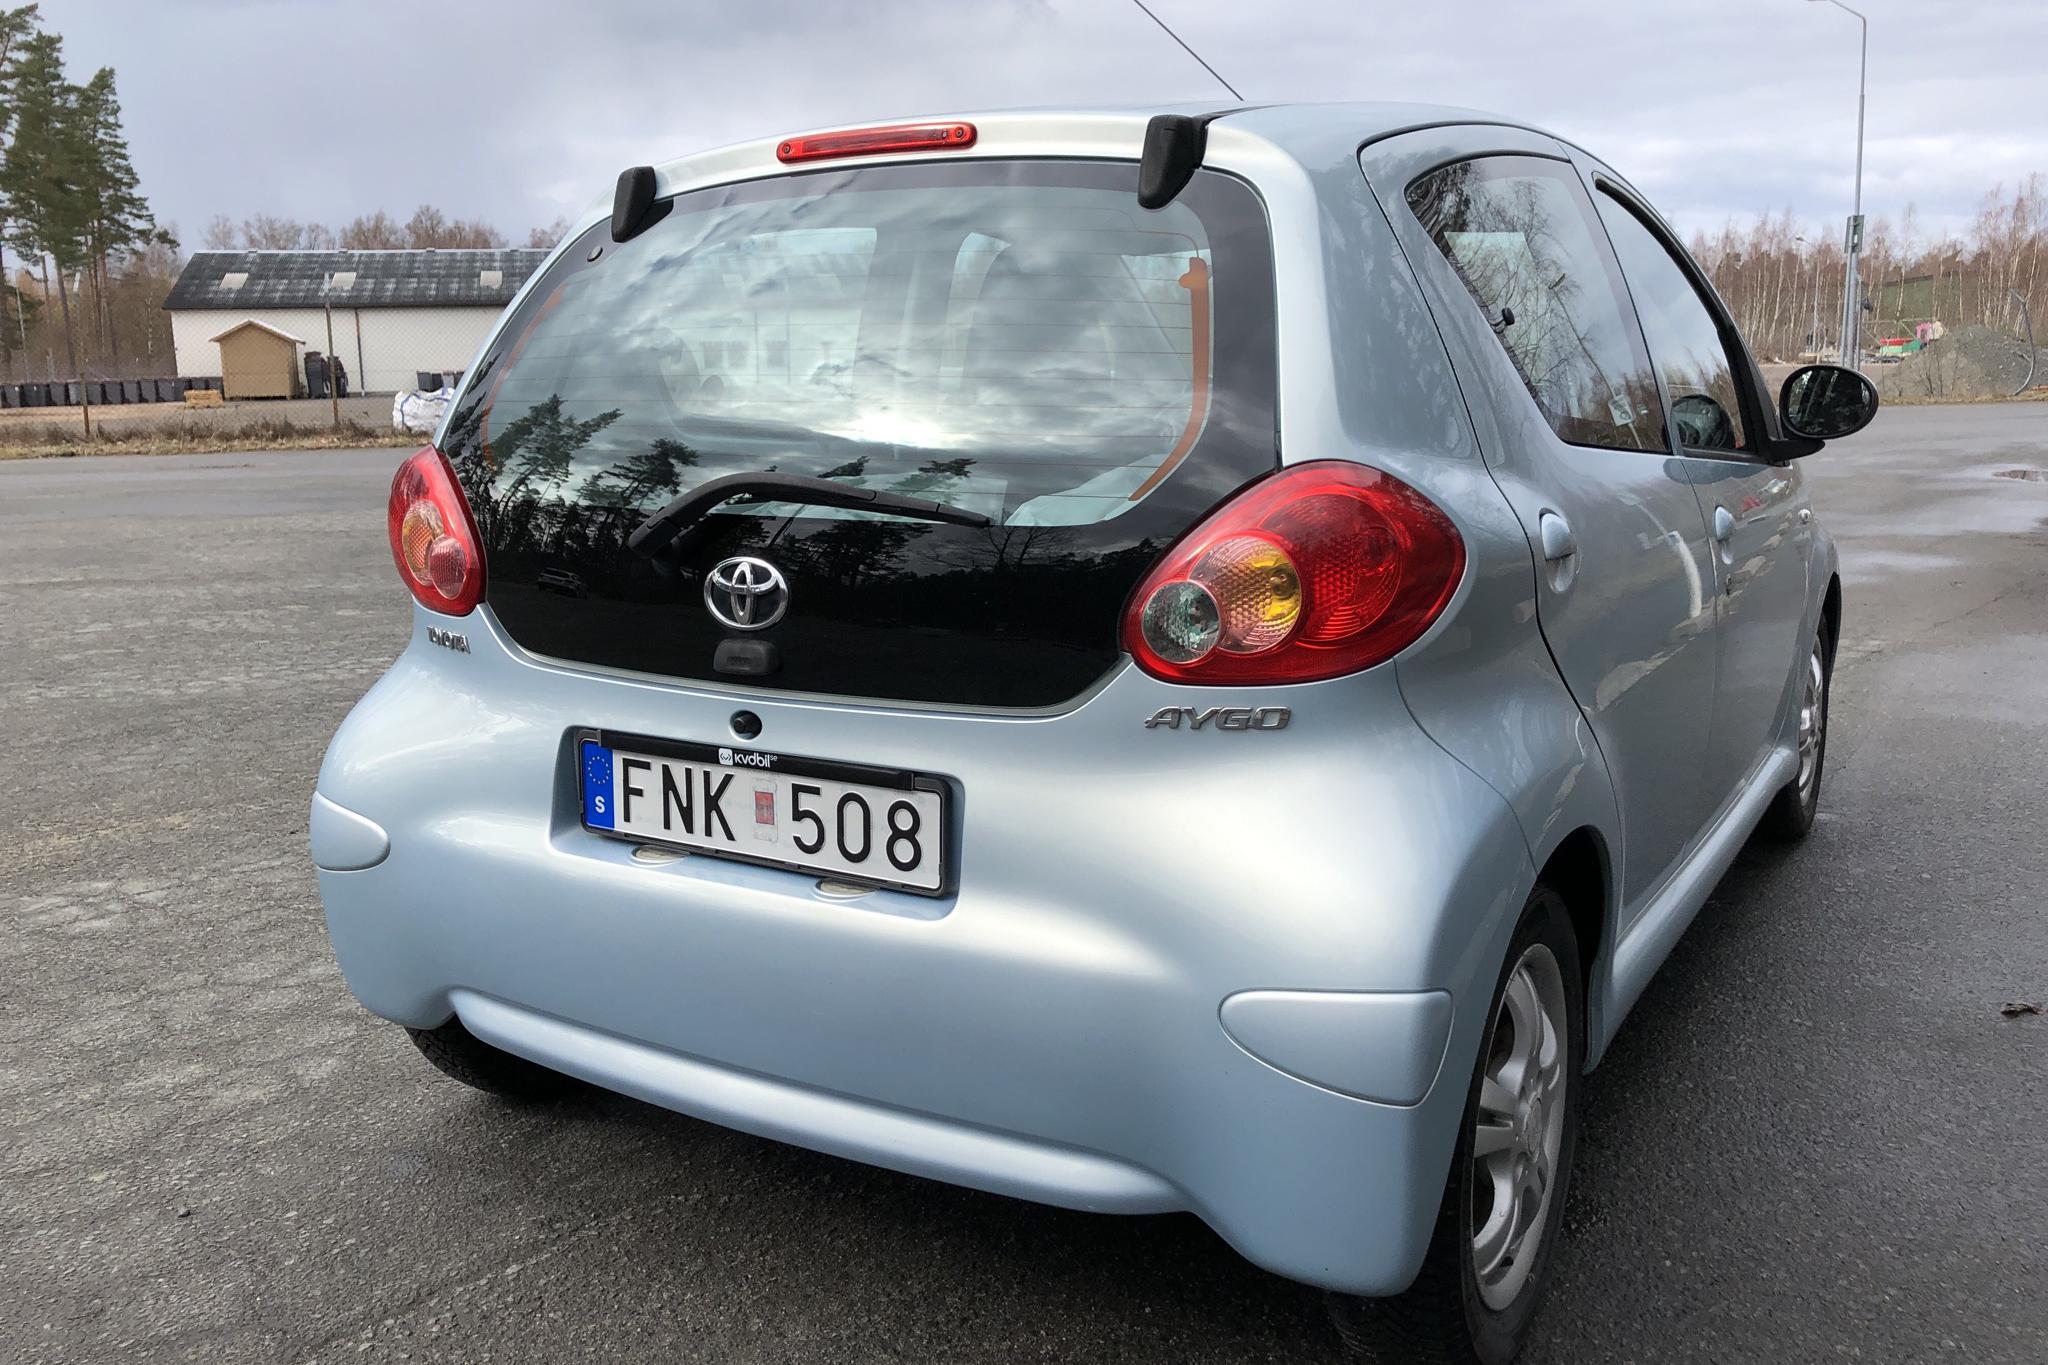 Toyota Aygo 1.0 VVT-i 5dr (68hk) - 7 922 mil - Manuell - Light Blue - 2008